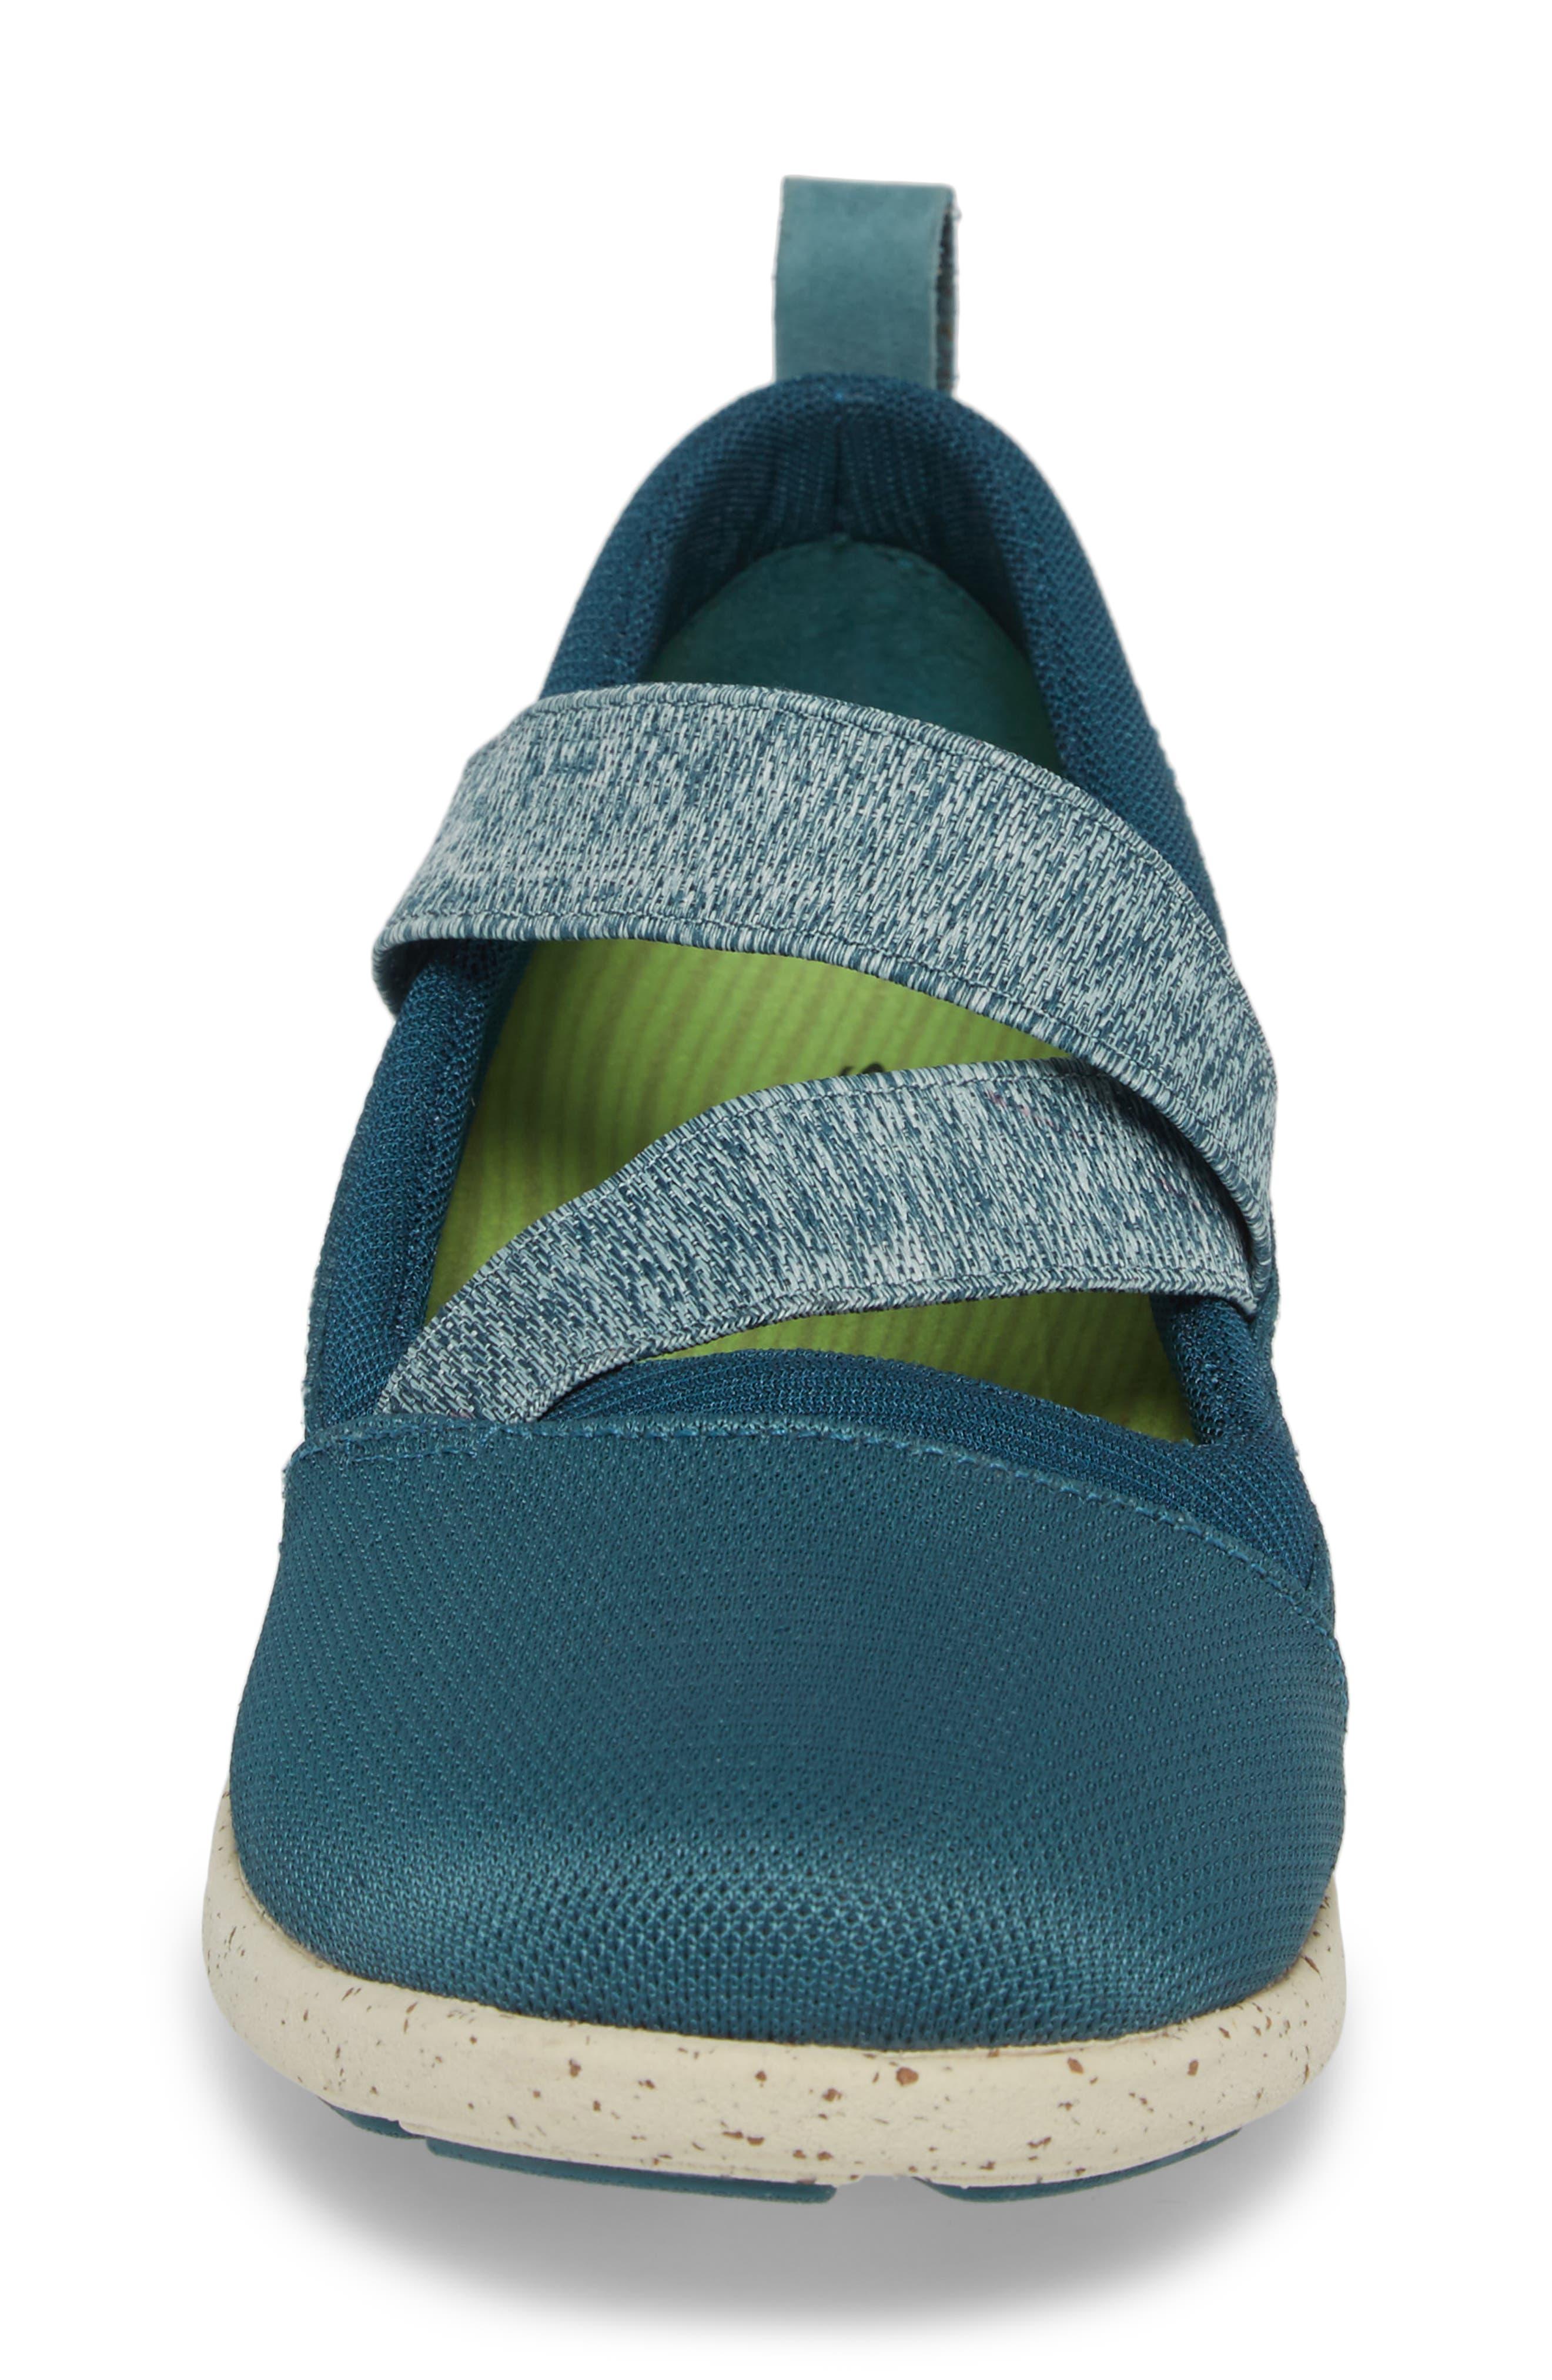 Palisade Sneaker,                             Alternate thumbnail 4, color,                             Balsam Blue Leather